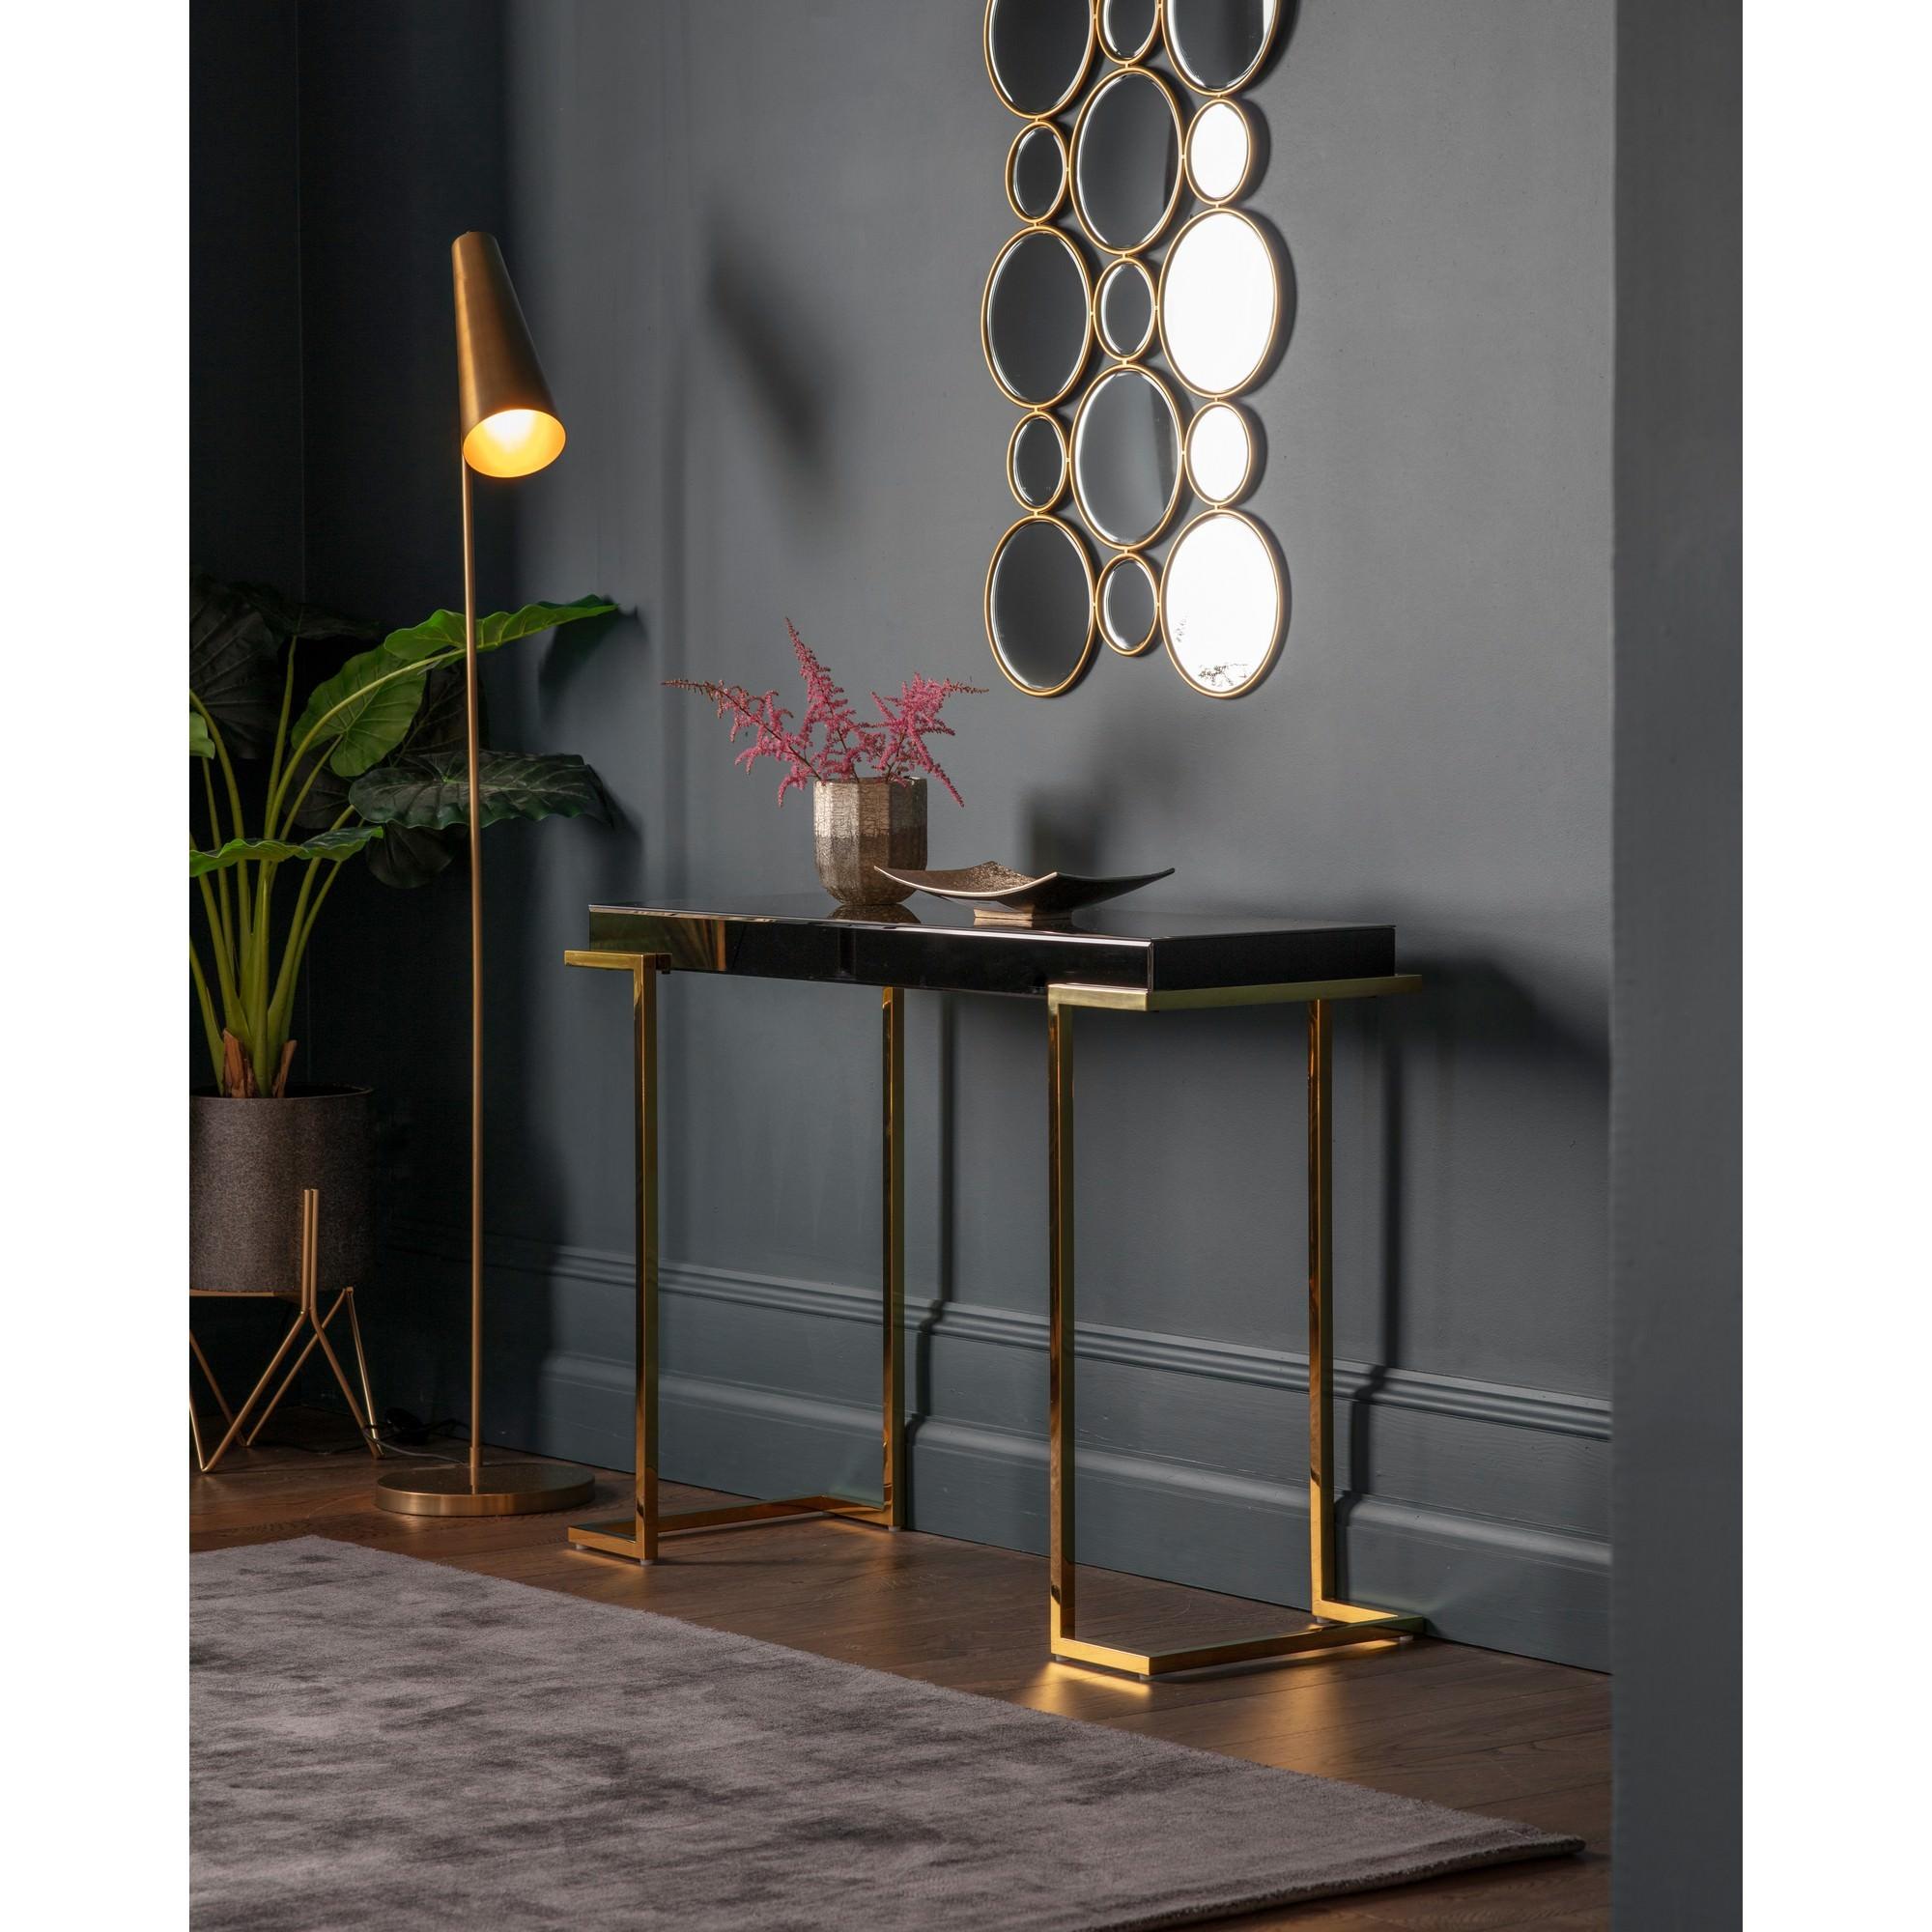 Daffey Mirrored Console Table, 117cm